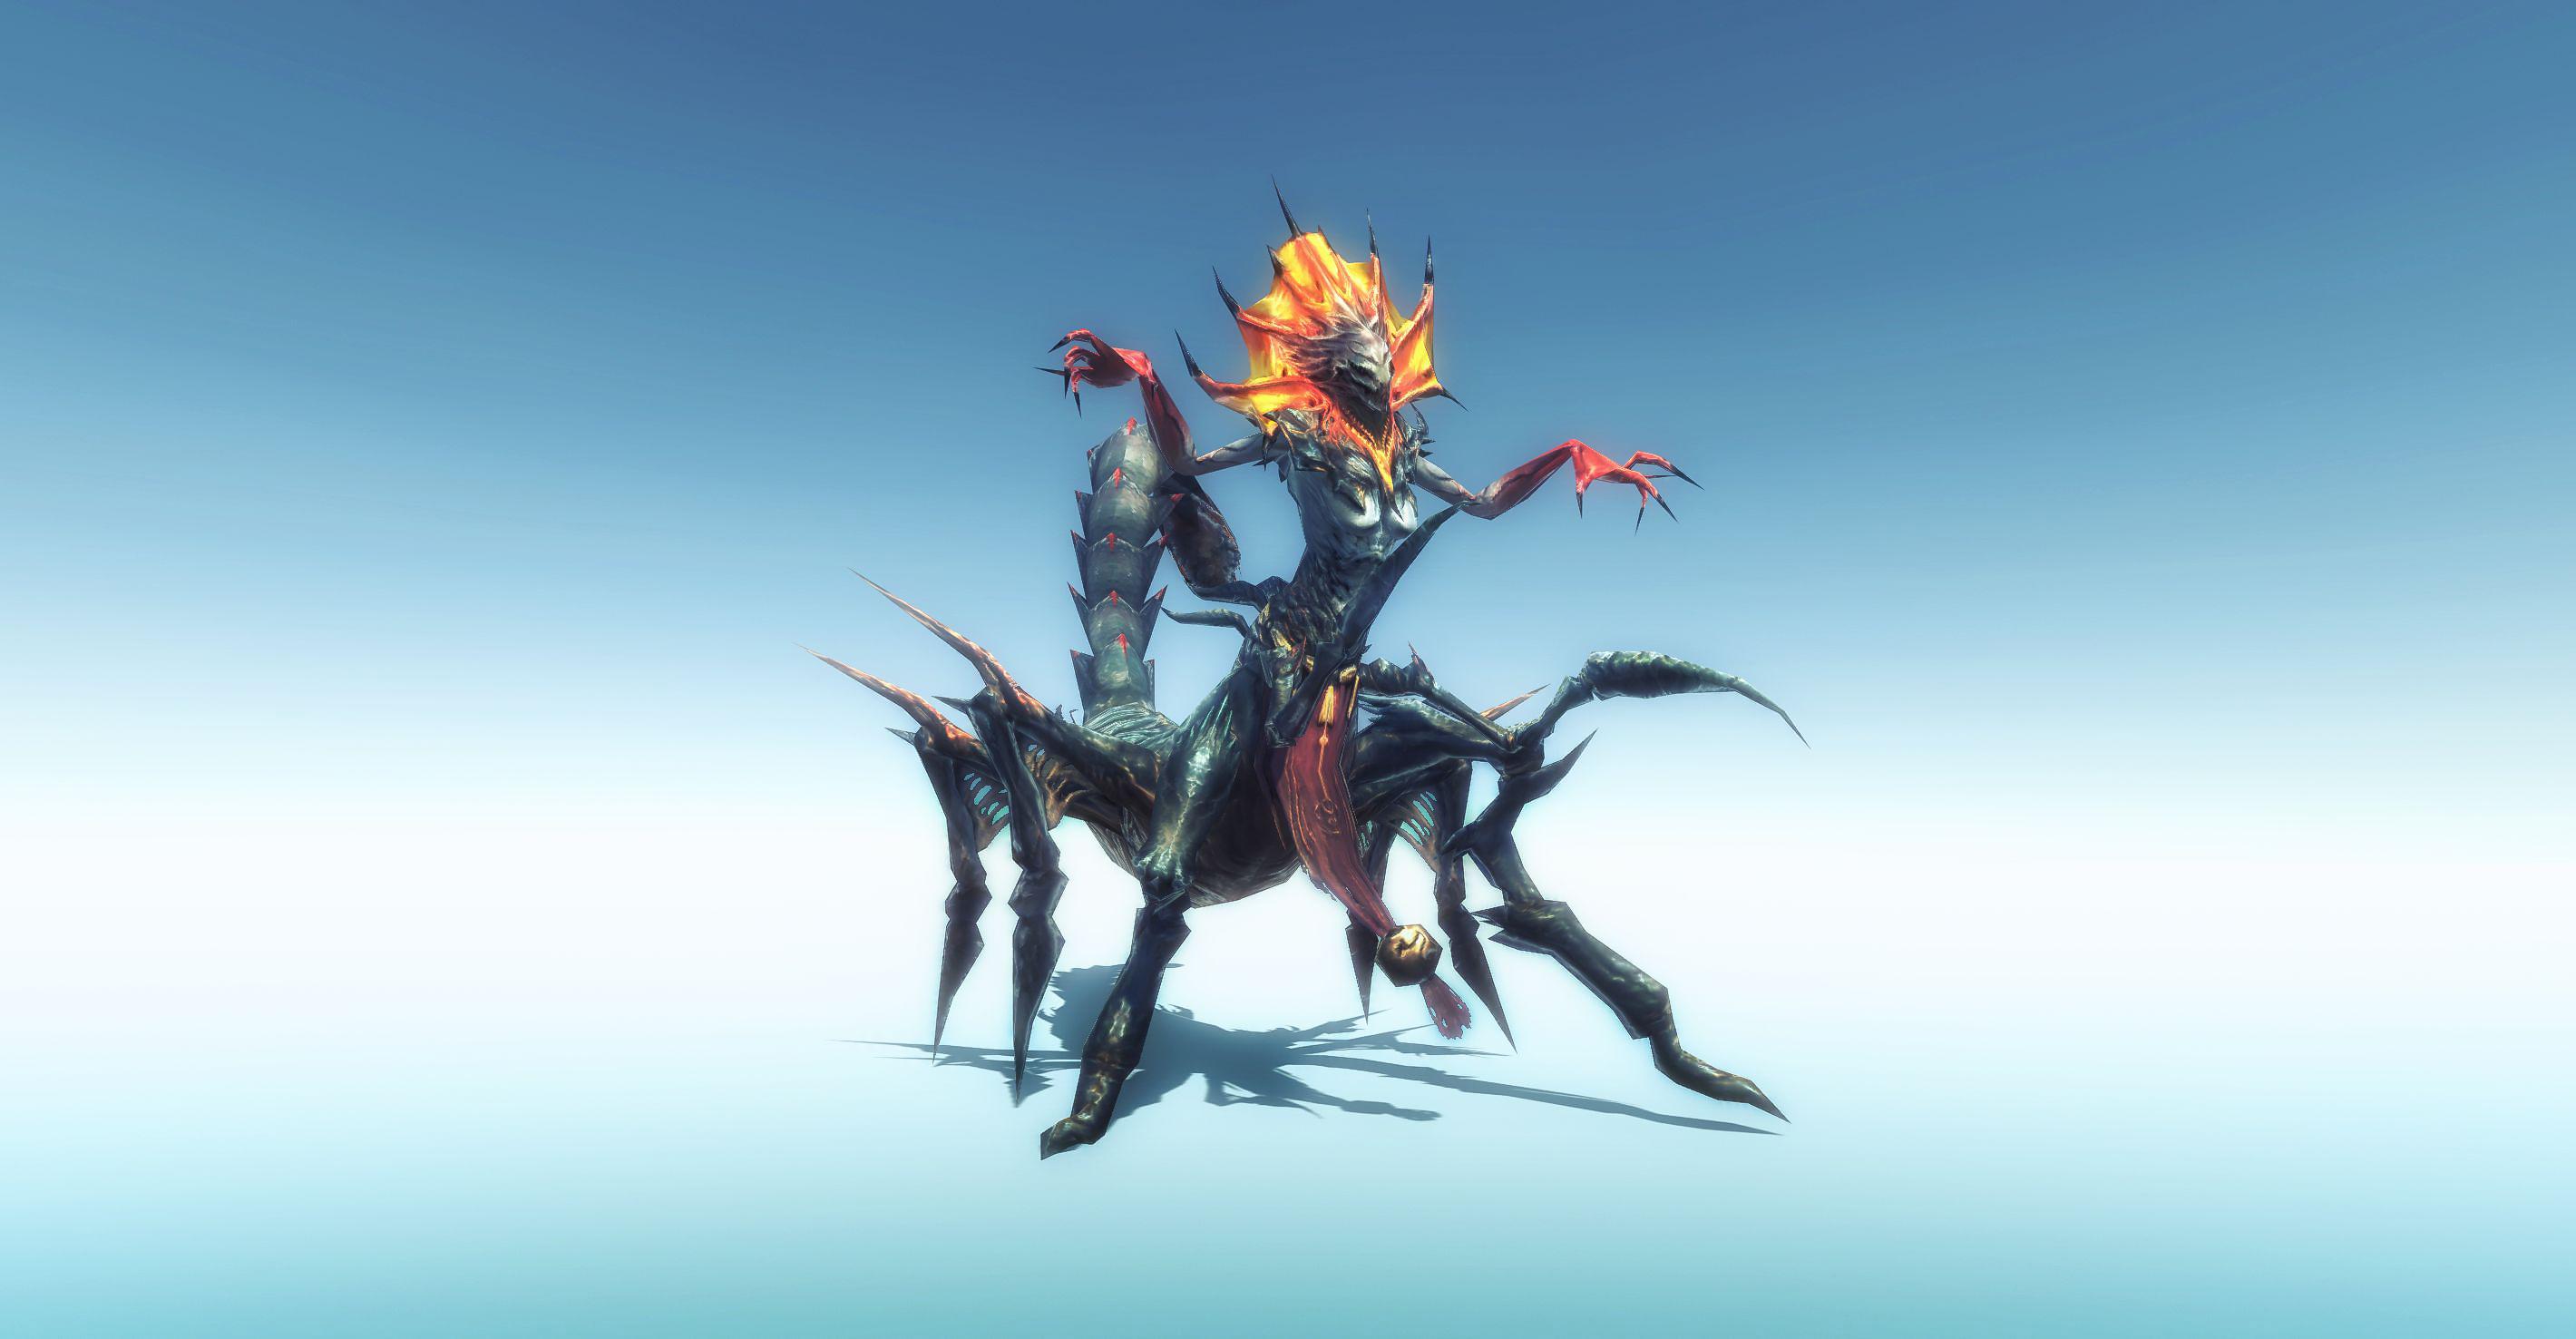 [Asset] Scorpion Queen Monster